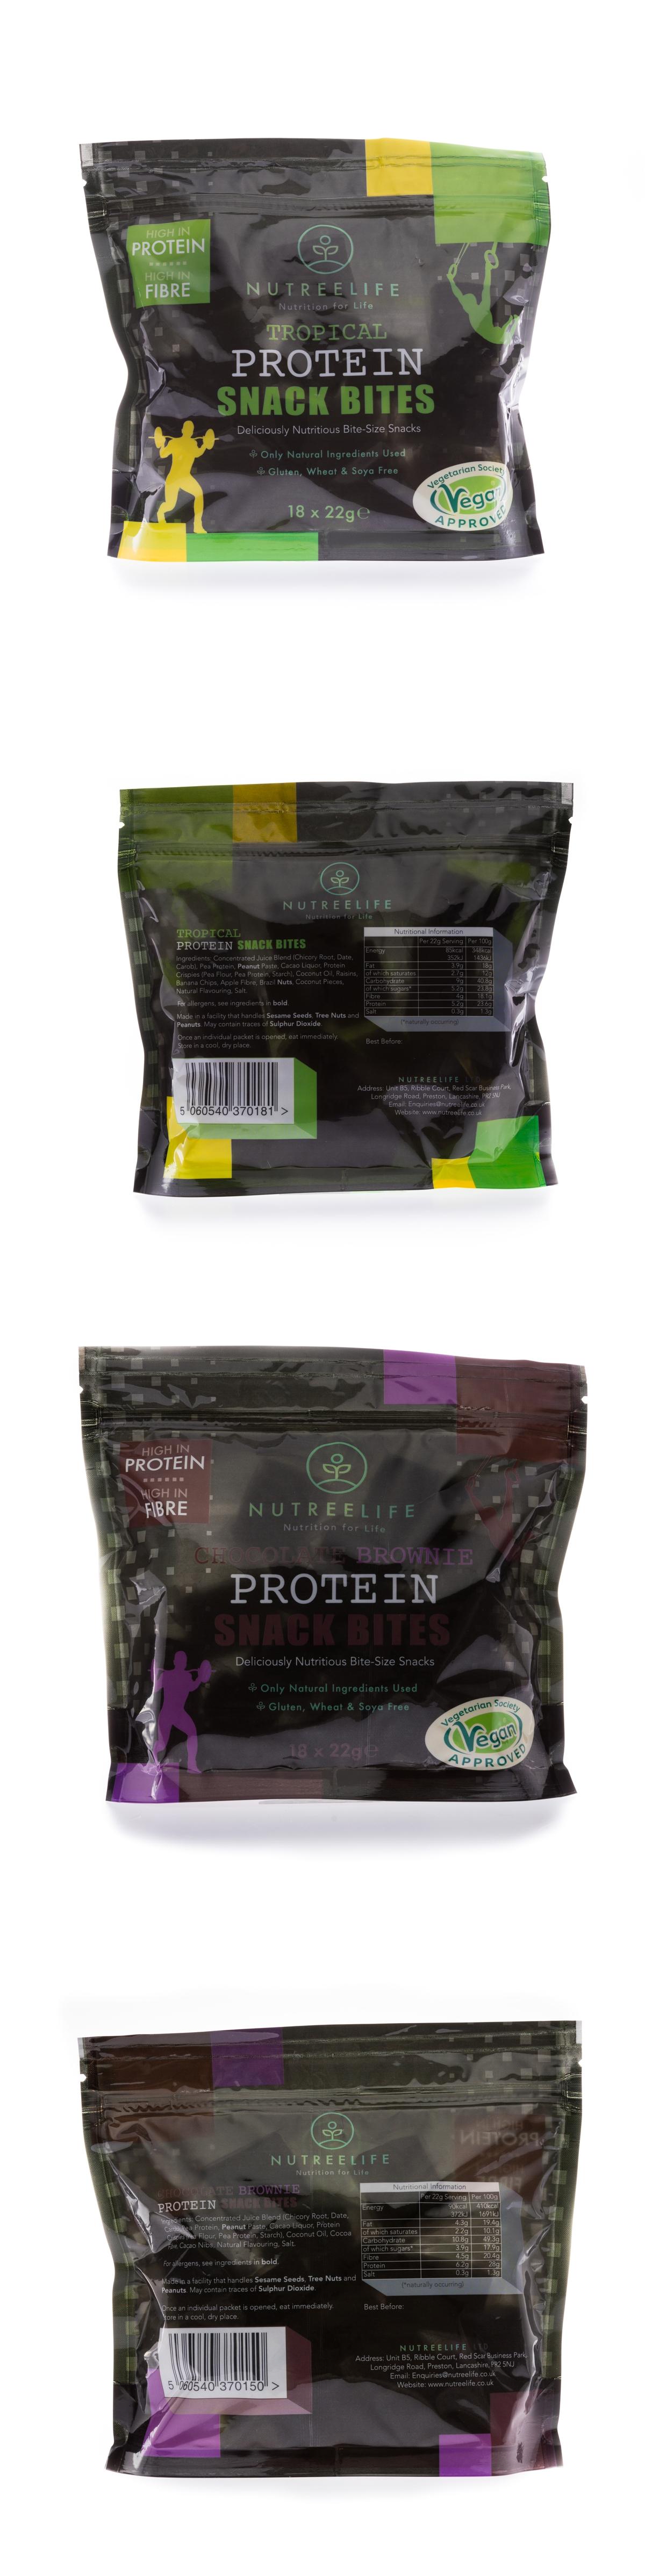 nutreelife vegan protein